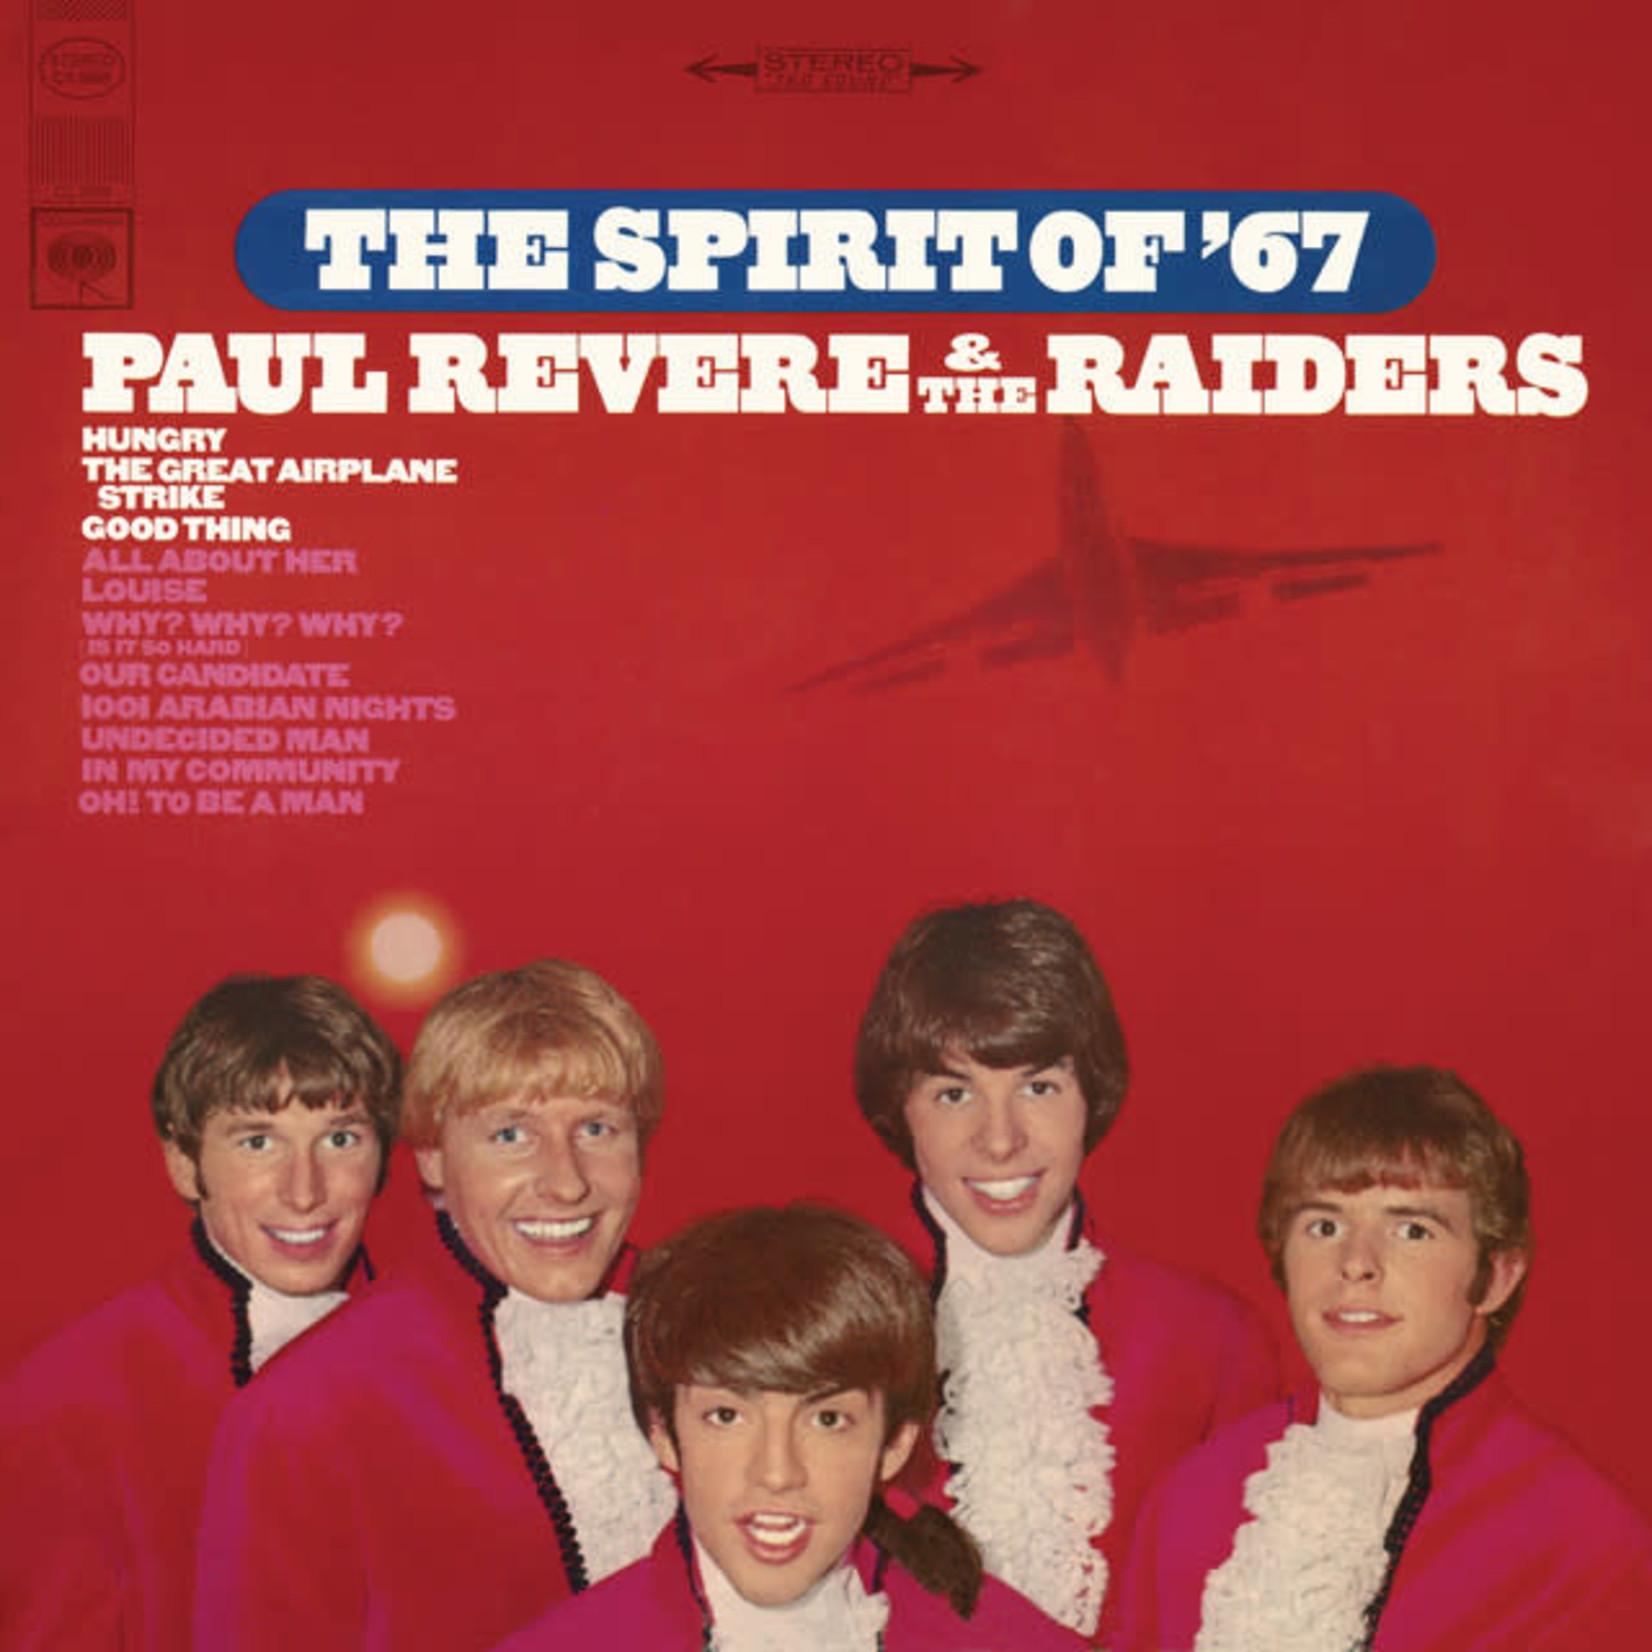 Vinyl Paul Revere & The Raiders - The Spirit of '67